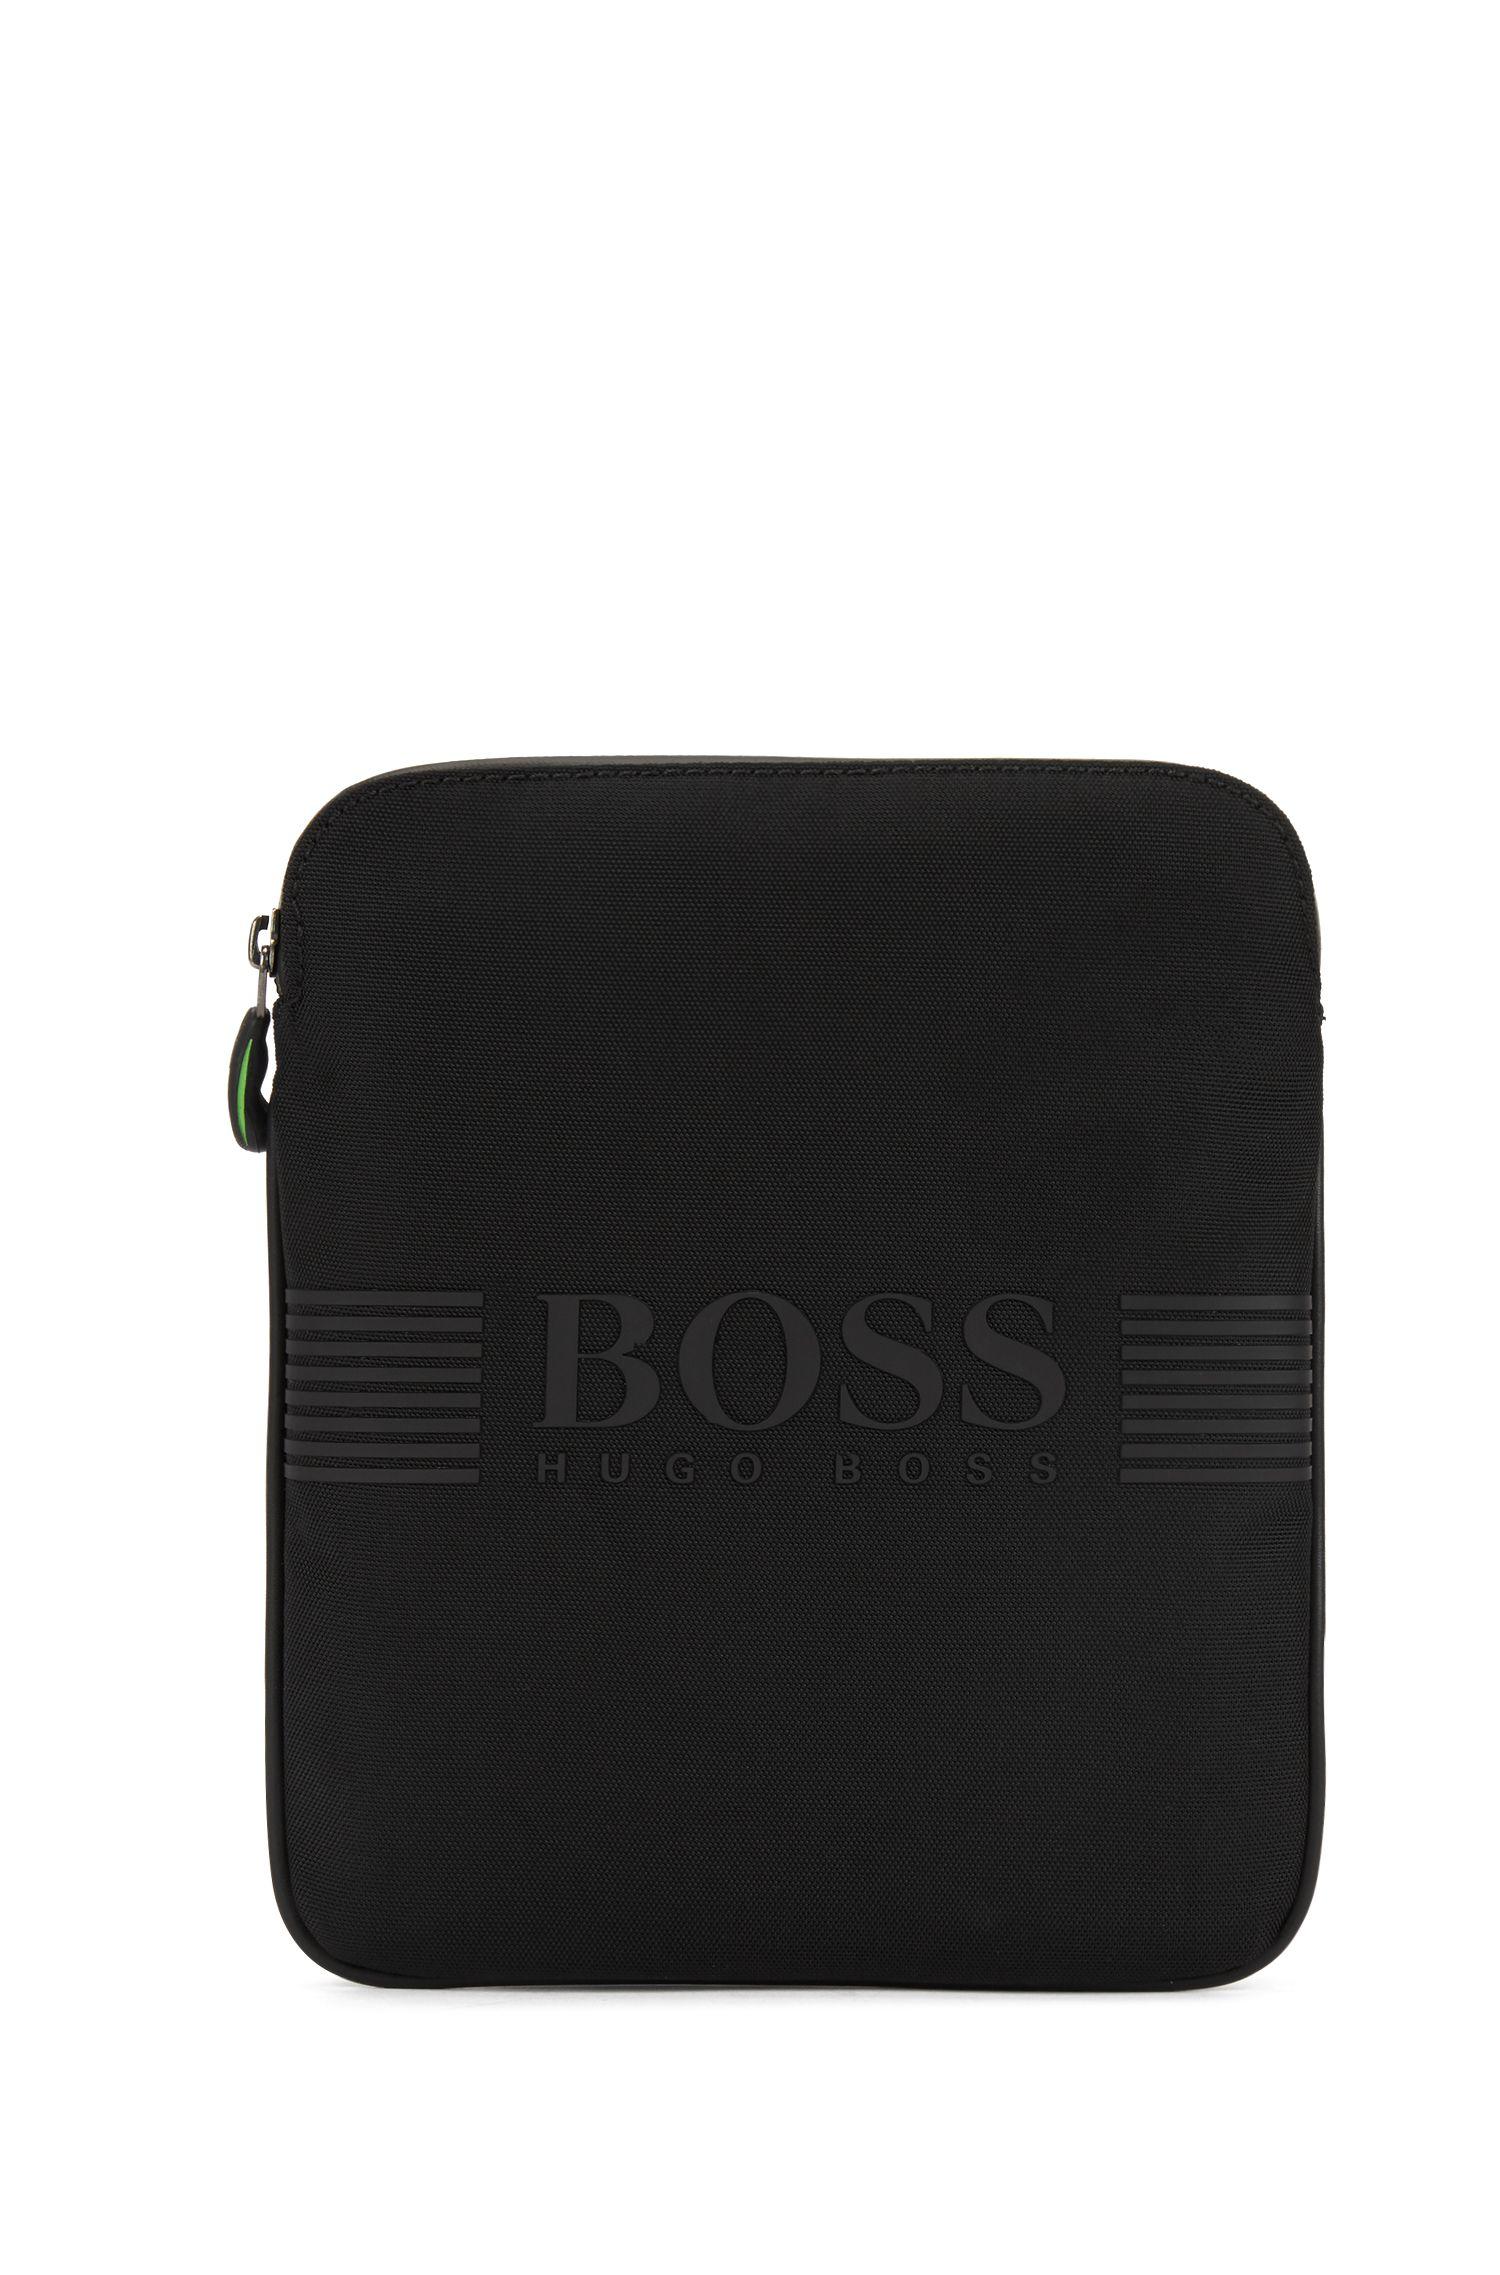 Cross-body bag in technical fabric